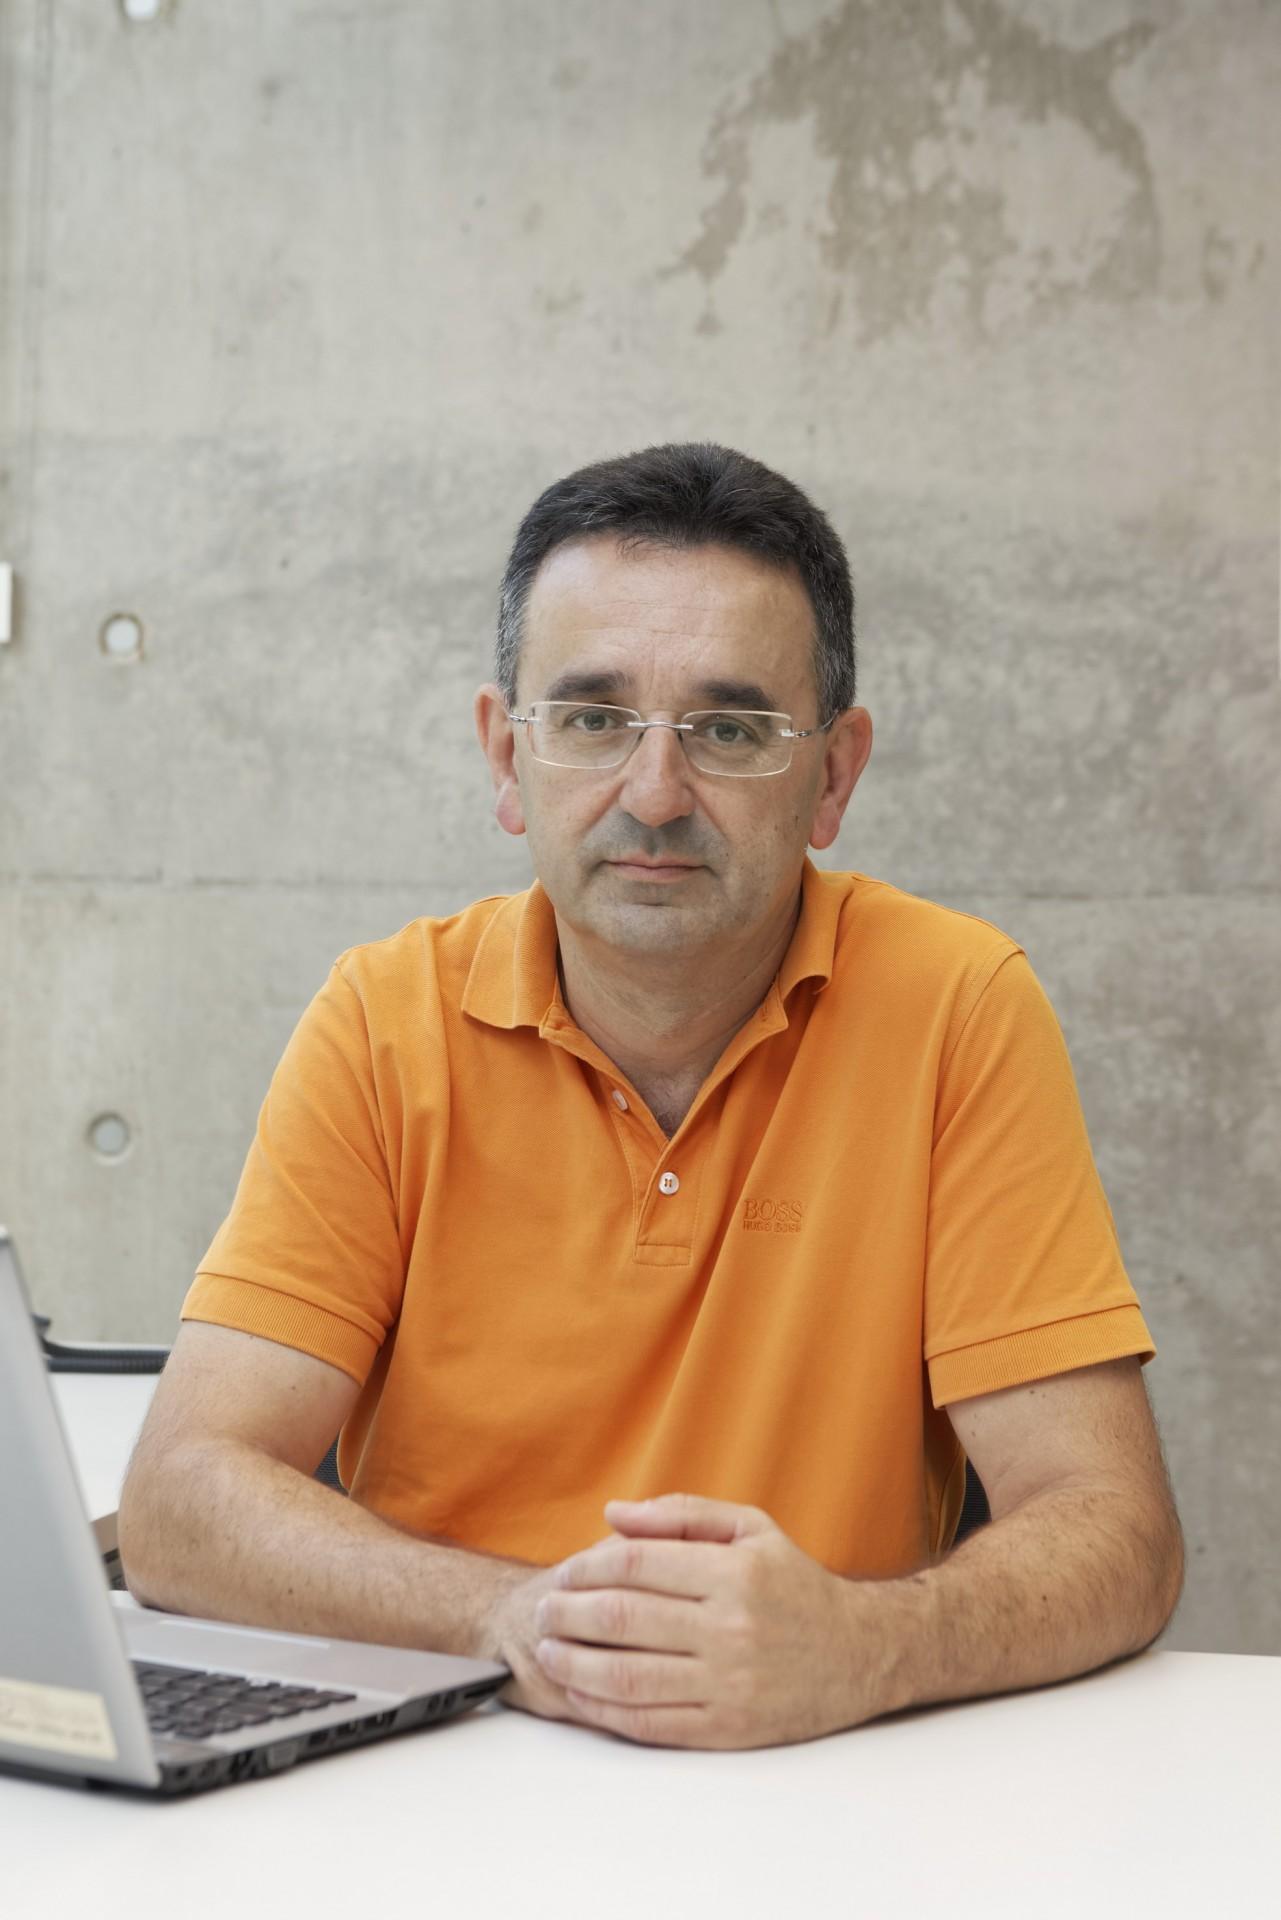 Entrevista a David Cabedo, Director Académico de Espaitec.